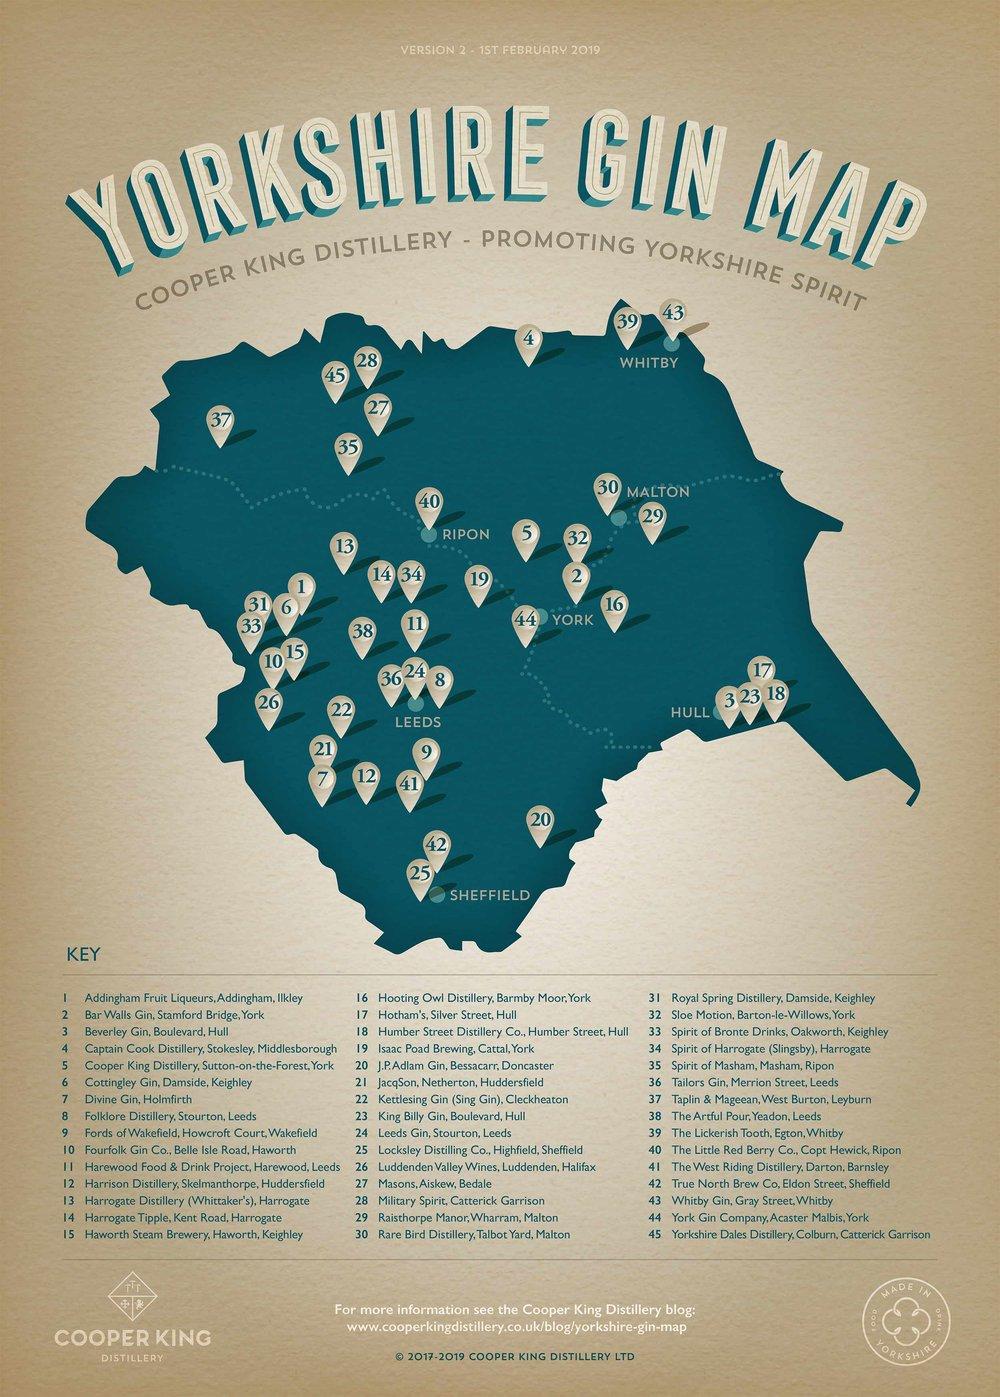 yorkshire_gin_map_cooper_king_distillery_2019_v2_2500px.jpg